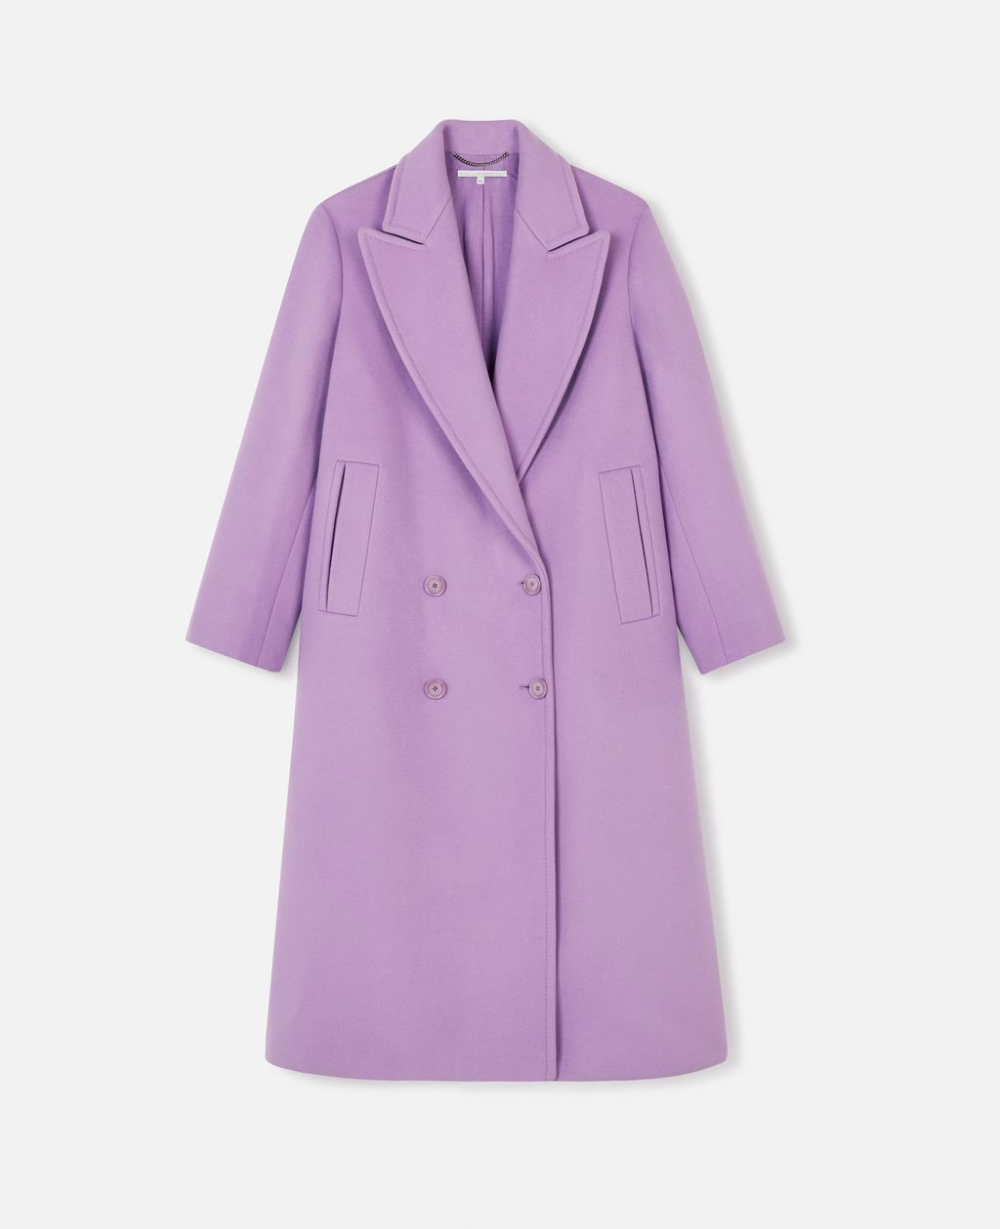 Women S Purple Catalina Coat Stella Mccartney Women In 2020 Stella Mccartney Coat Mccartney [ 1229 x 1000 Pixel ]